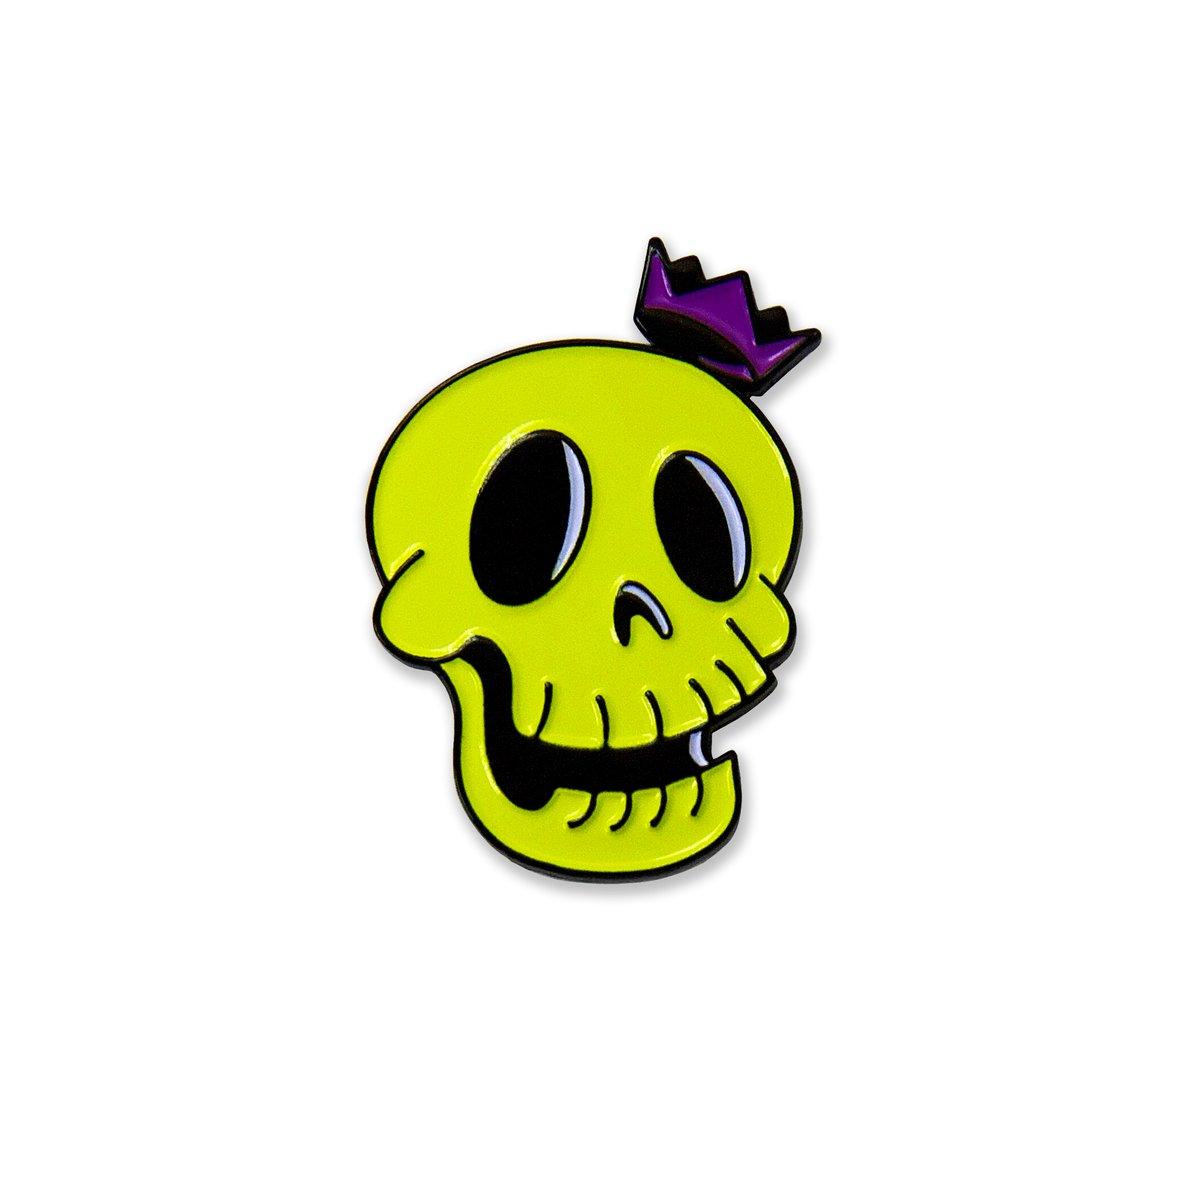 Image of BoneDaddy Enamel Pin